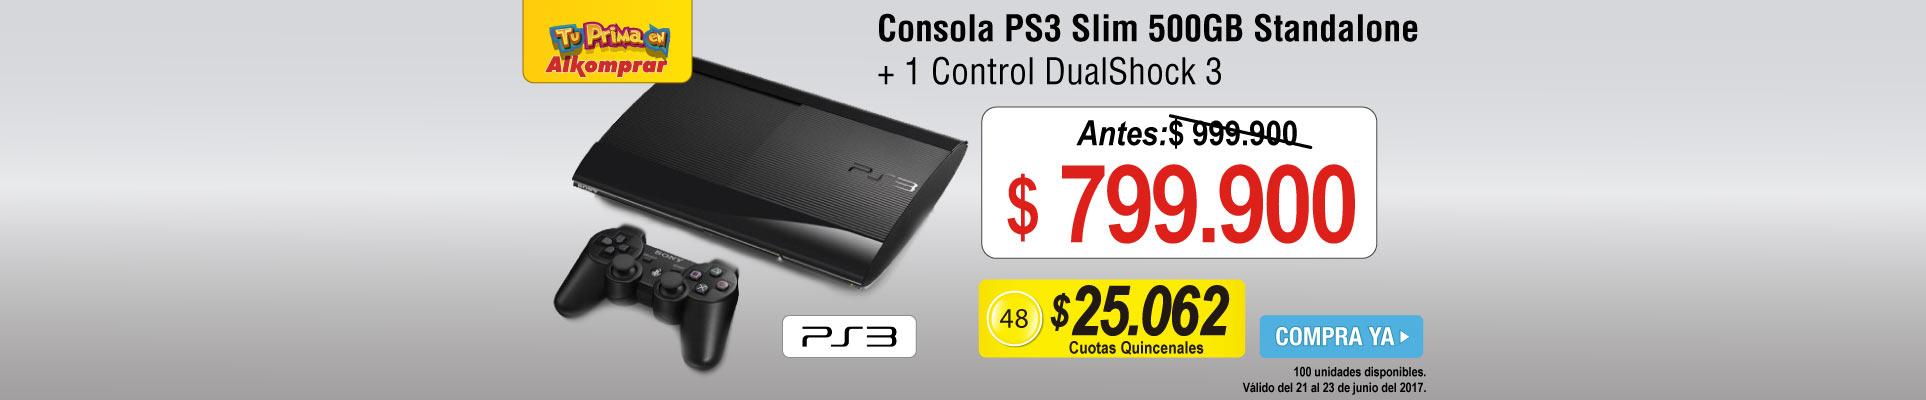 Consola PS3 Slim 500GB Standalone + 1 Control DualShock 3 - banner principal